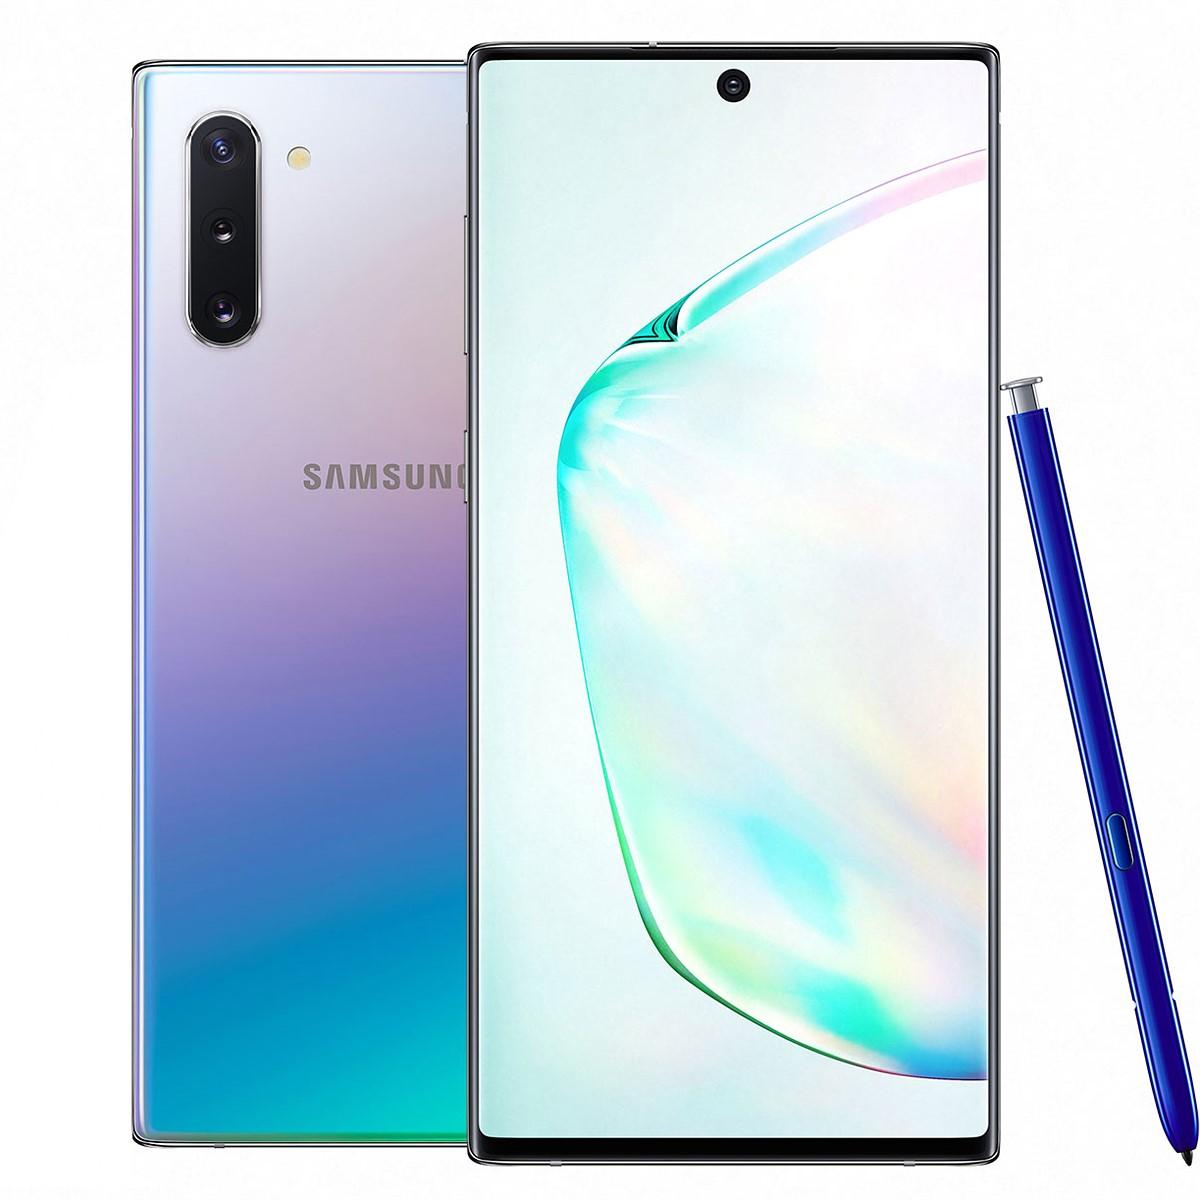 Samsung launches triple-camera Galaxy Note 10 series: Digital